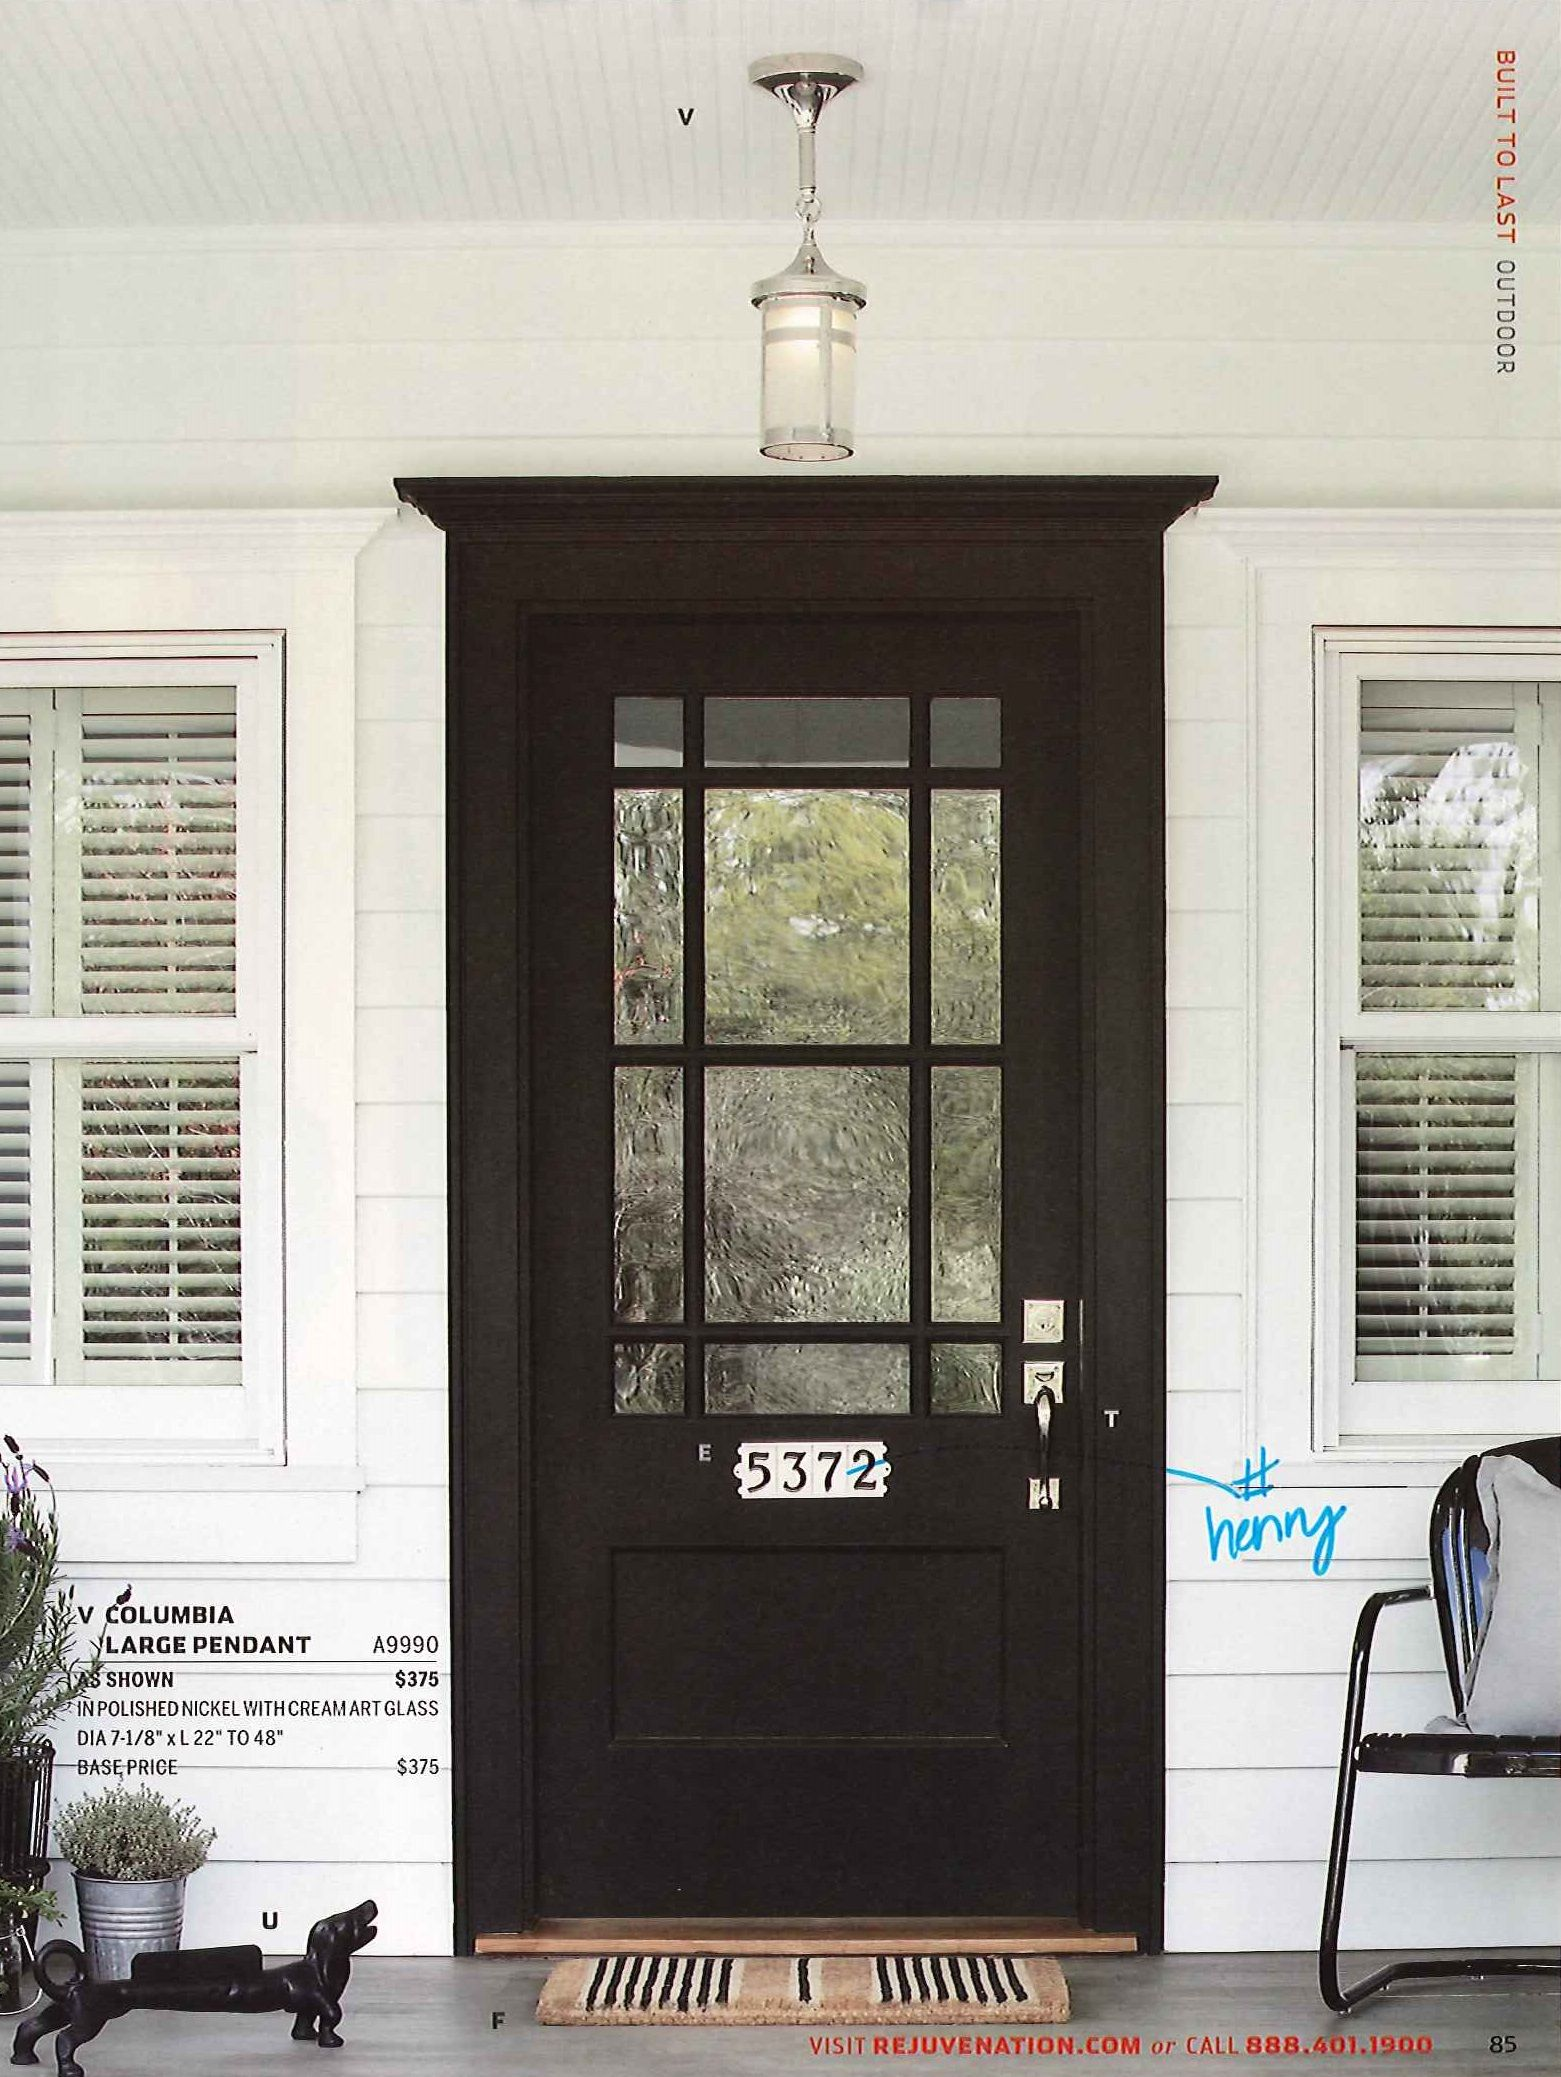 Black Front Door White House Pendant Porch Light Welcome Mat Brick Exterior House Front Door Paint Colors Best Front Doors